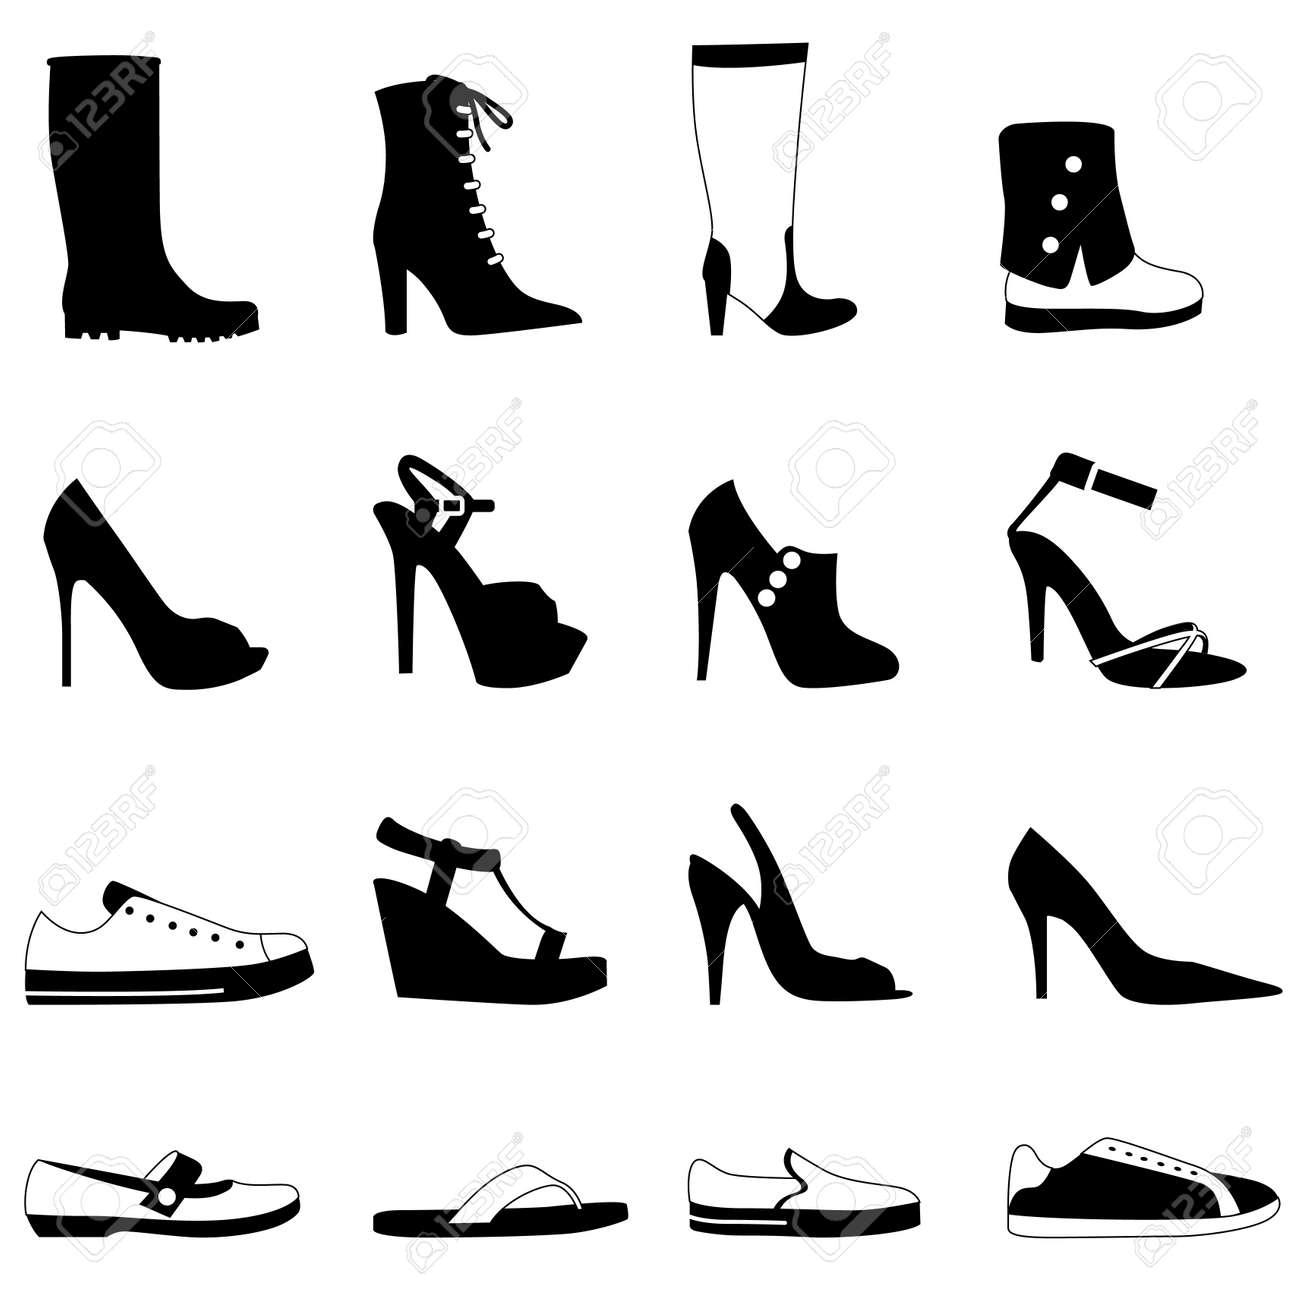 Boots fashion pic boots clip art - Rubber Boots Fashion Woman Shoes